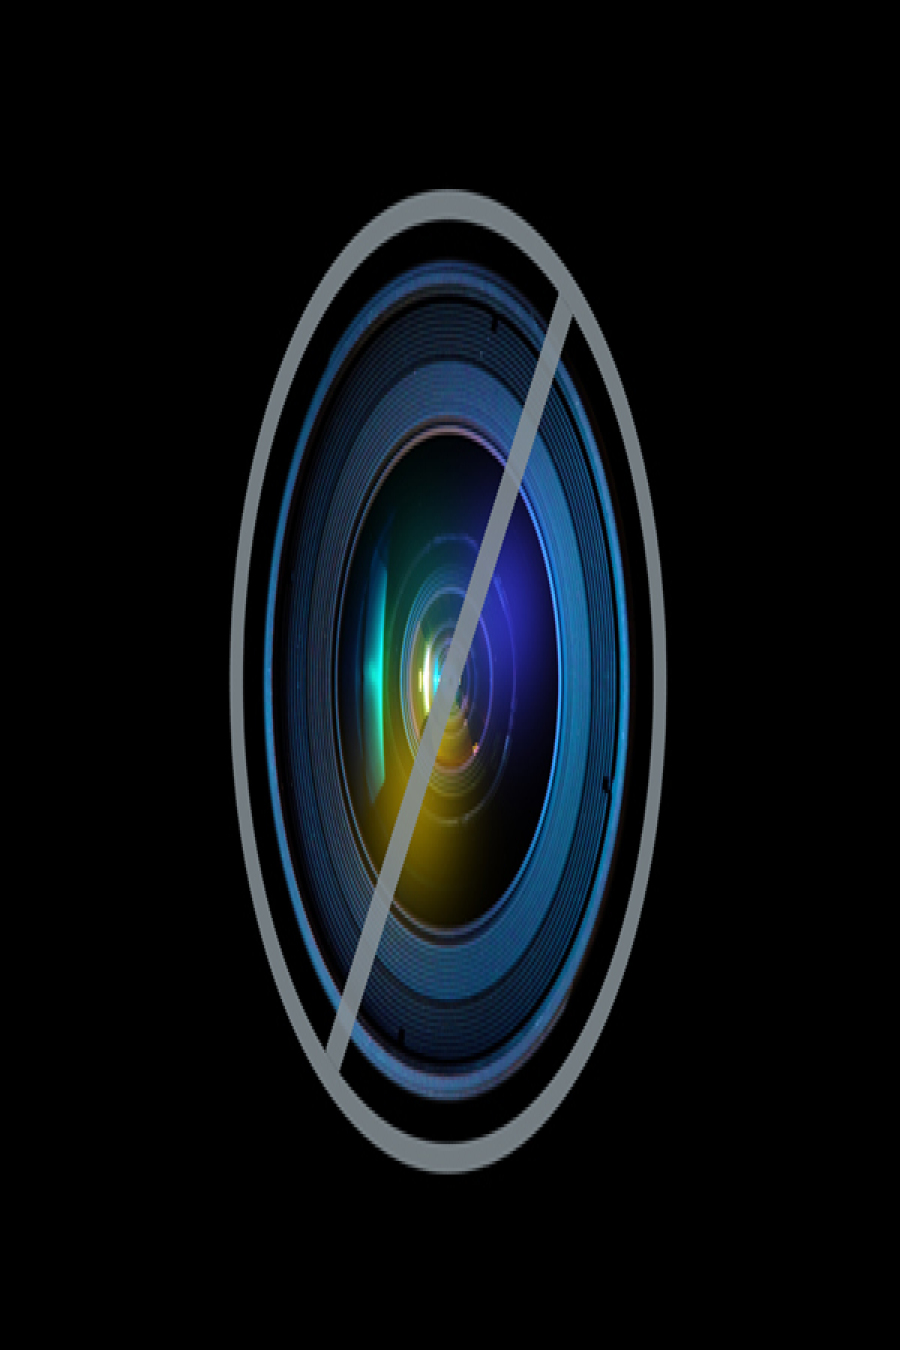 moving image 4